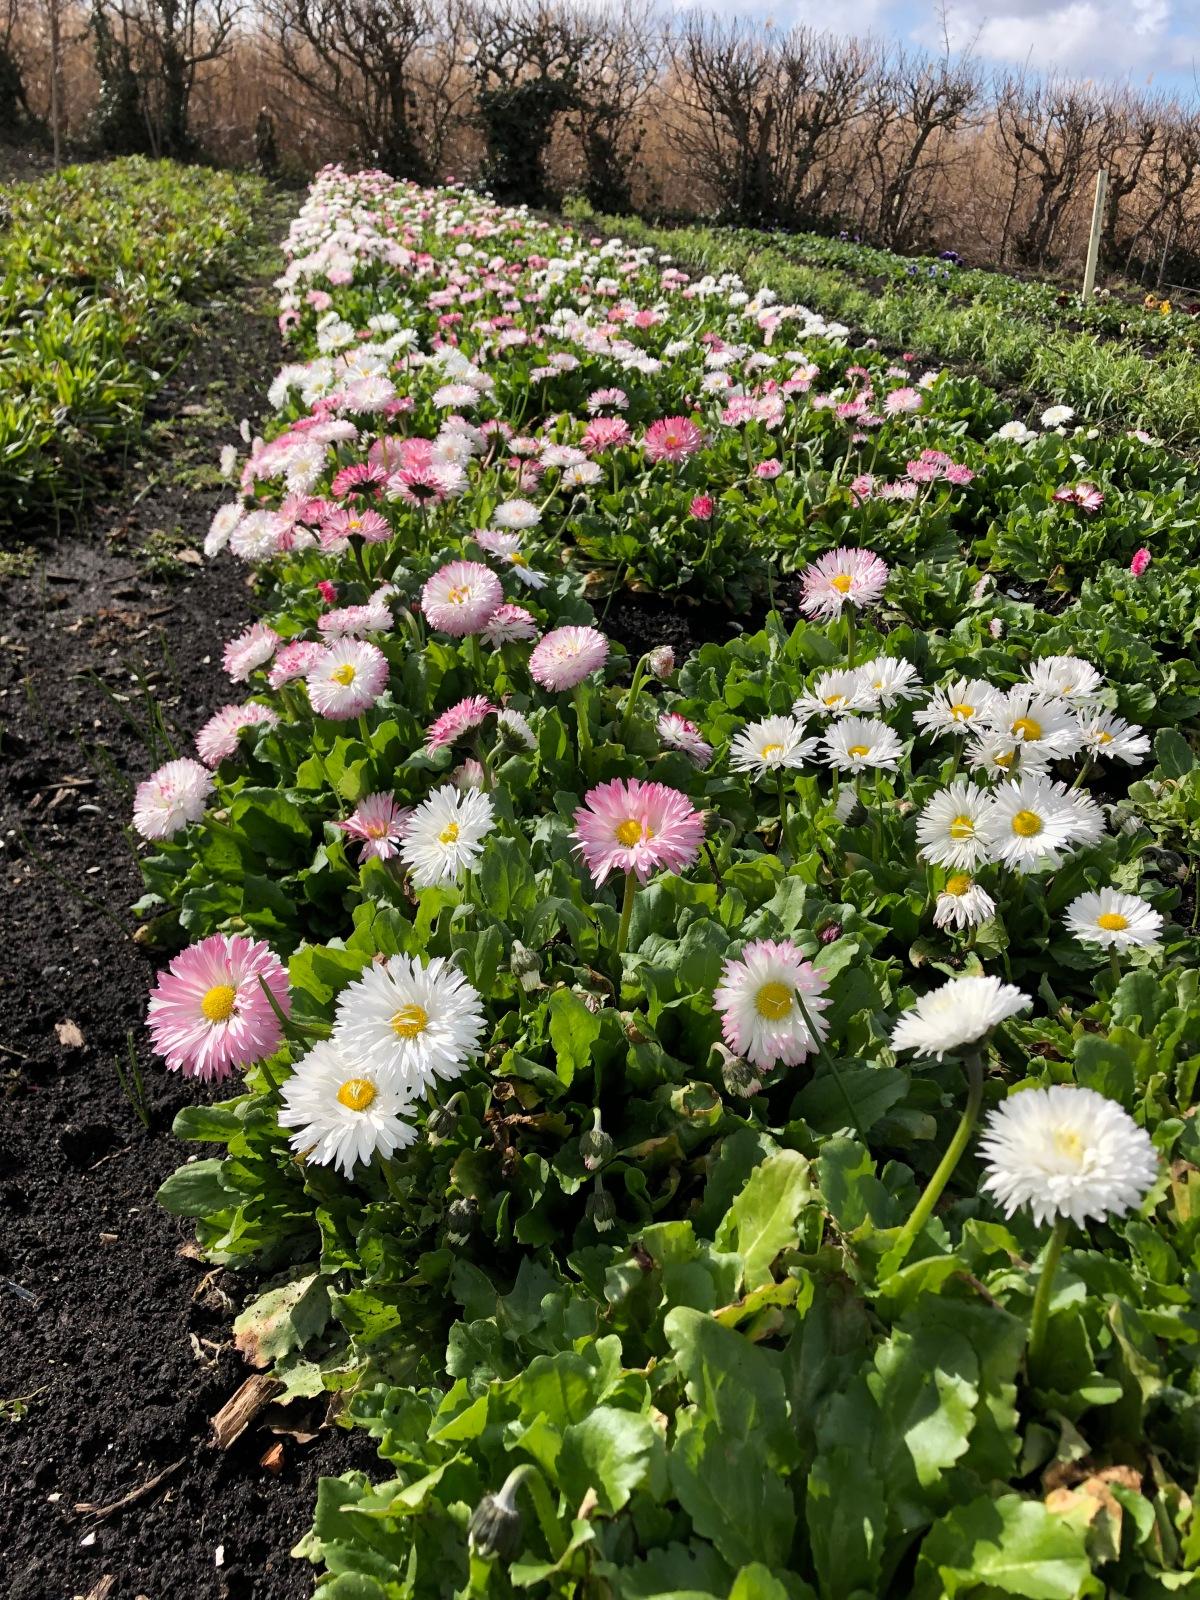 English Daisy - Bellis perennis 'Monstrusa'